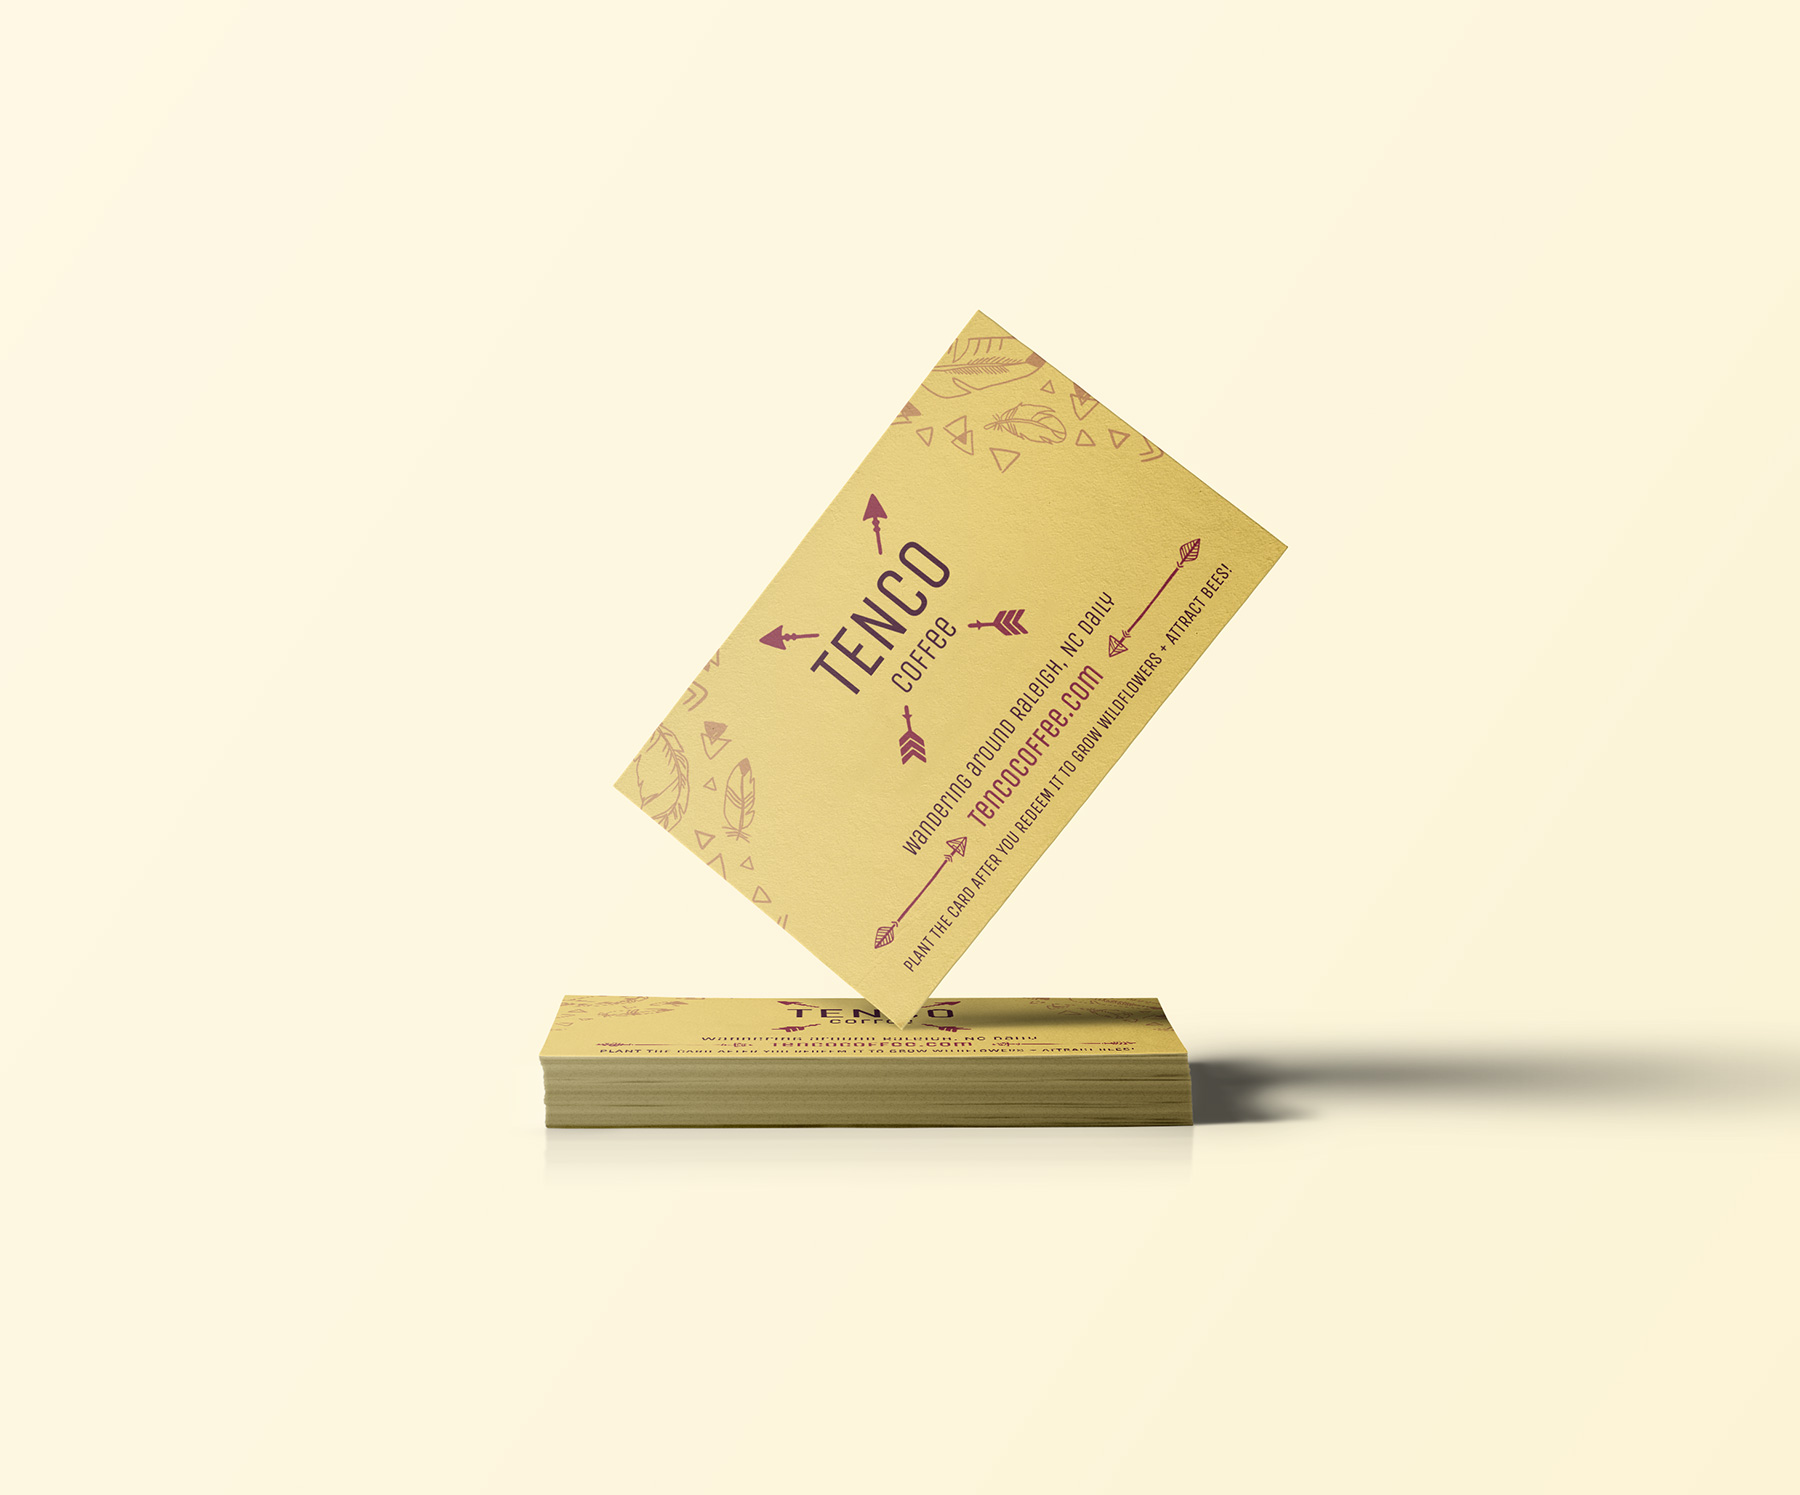 Carole_Chevalier-Tenco-Coffee-8.jpg